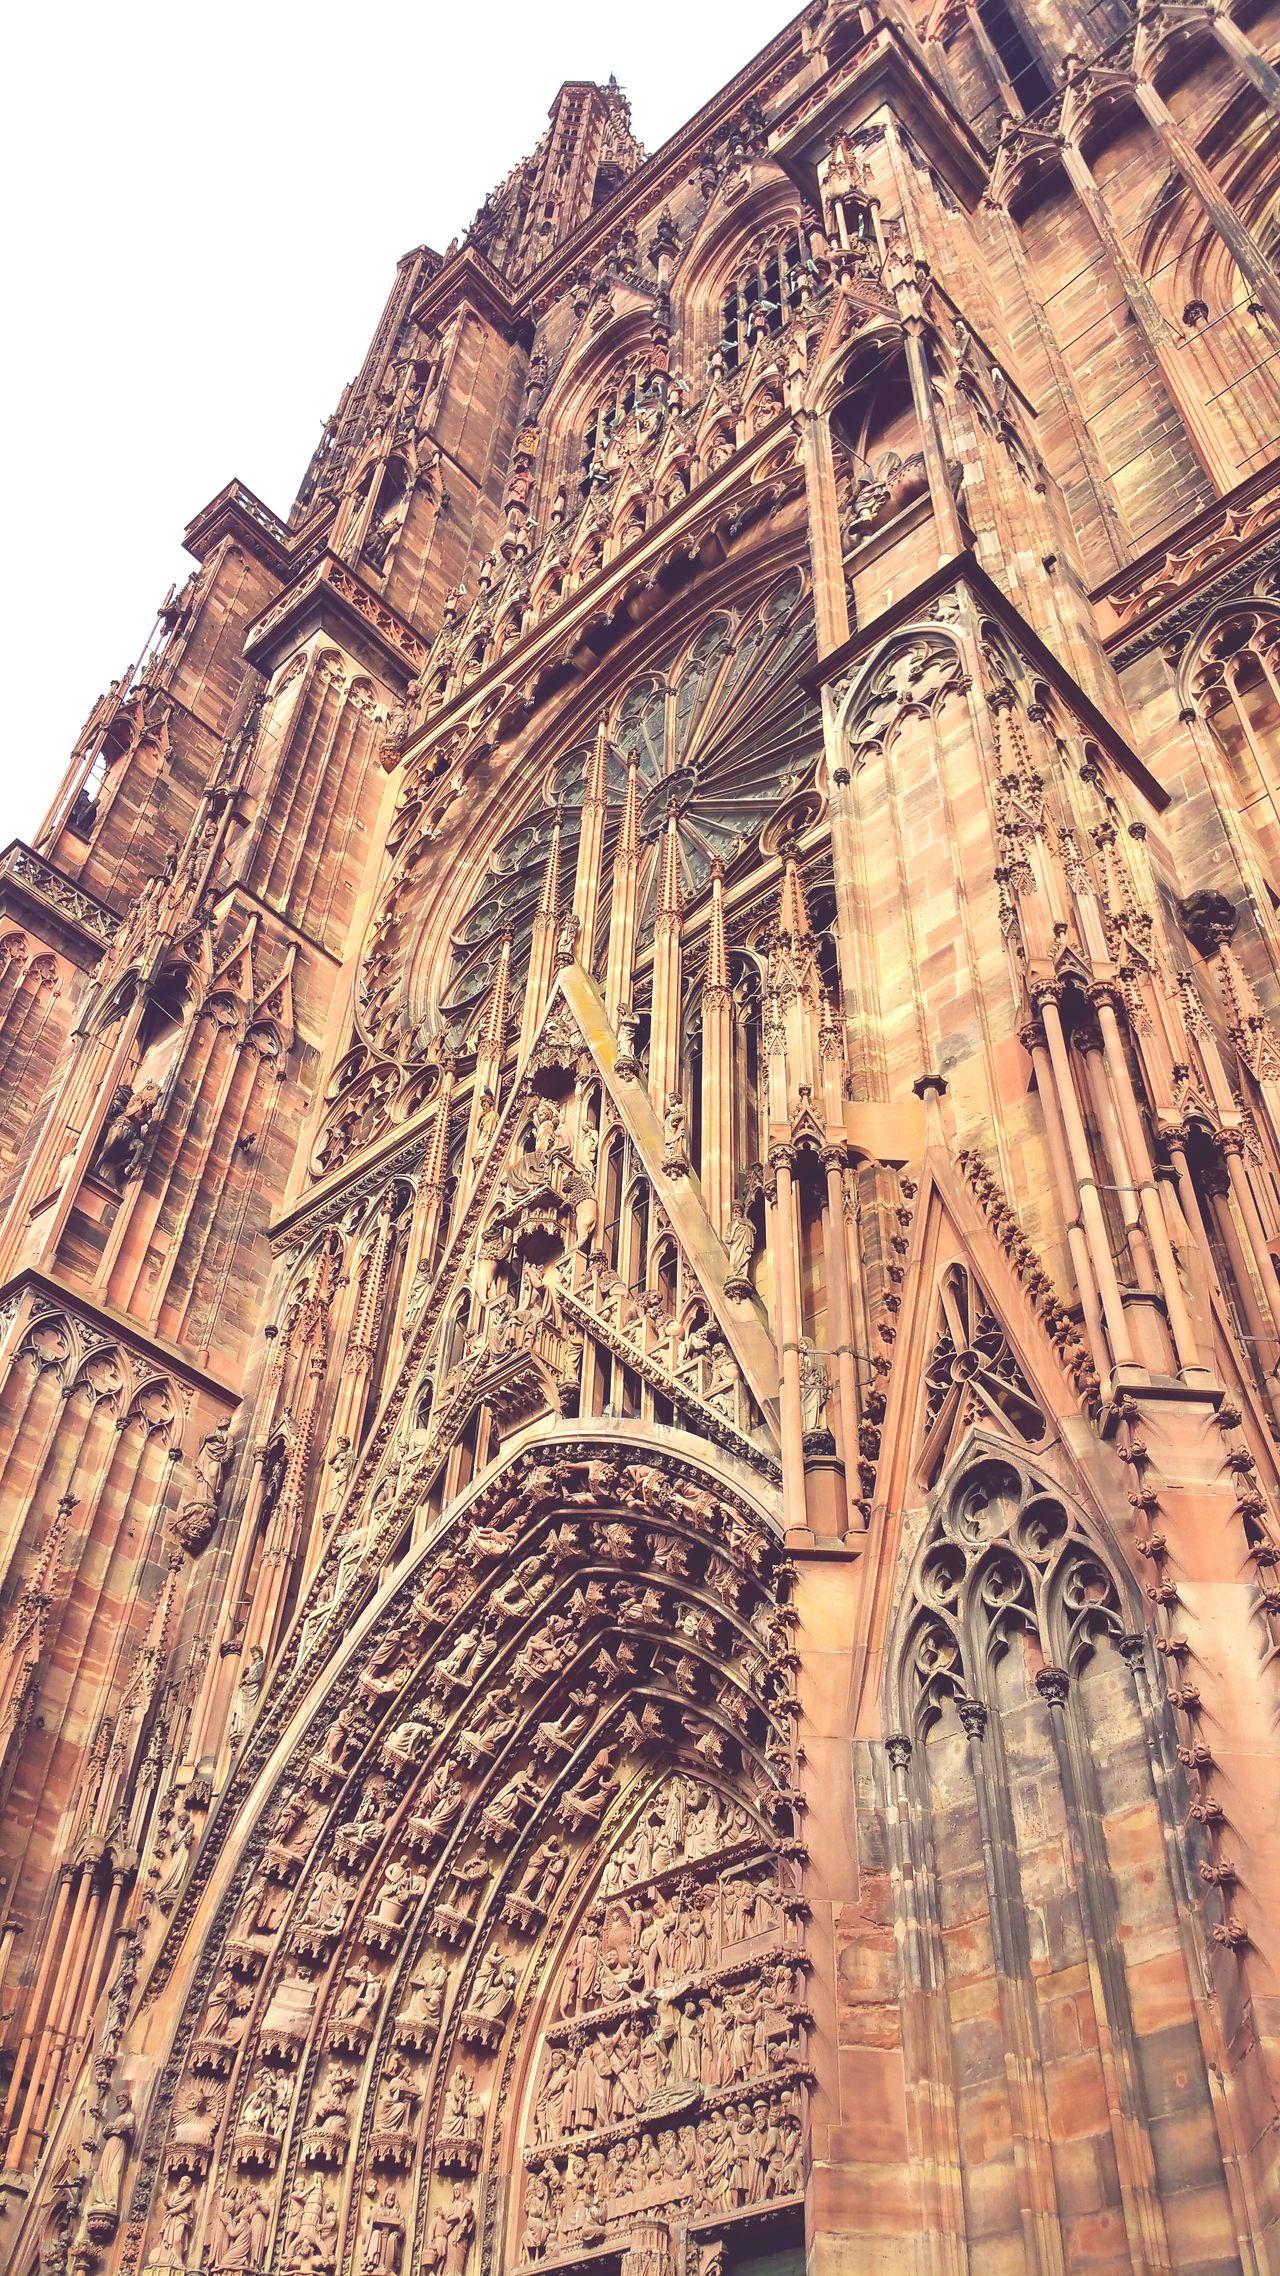 Strasbourg Cathedral (Cathédrale Notre-Dame de Strasbourg) Cathedral Cathedrale Cathedralenotredame Cathedral Of Our Lady Strasbourg Strasbourg Cathedral France Strasbourgcathedral Alsace Alsace France Cathédrale Notre Dame